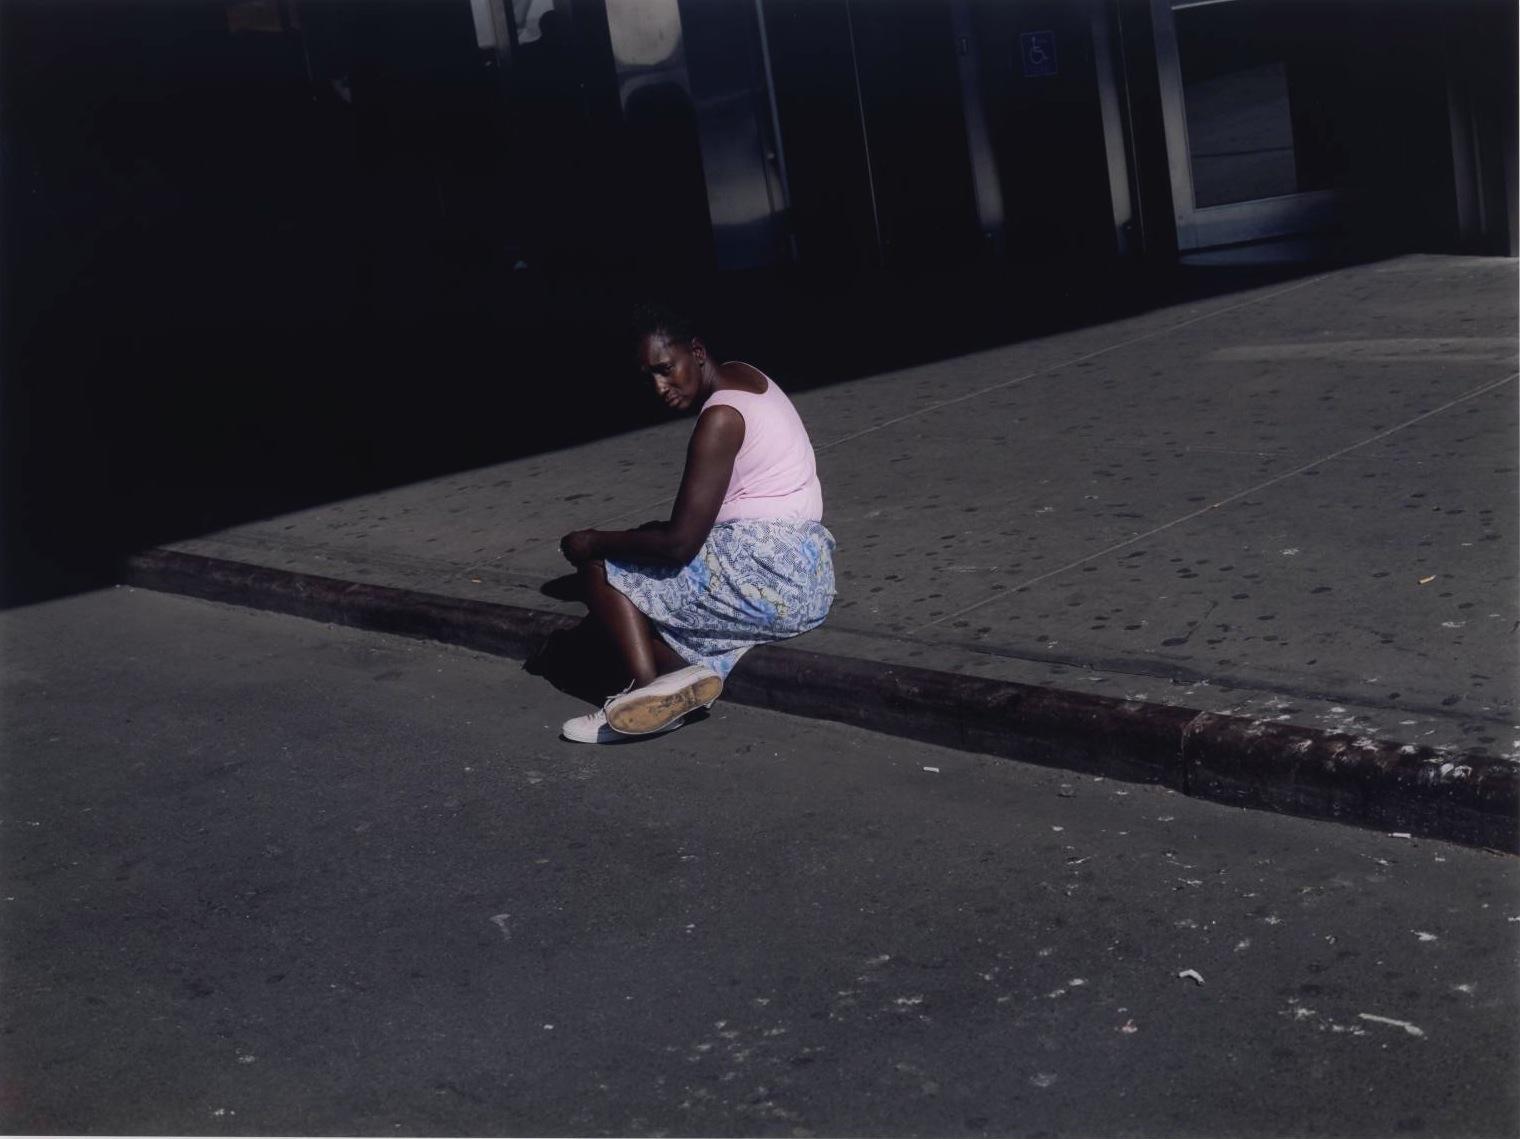 Woman on Sidewalk ,New York,  2002 by Paul Graham.